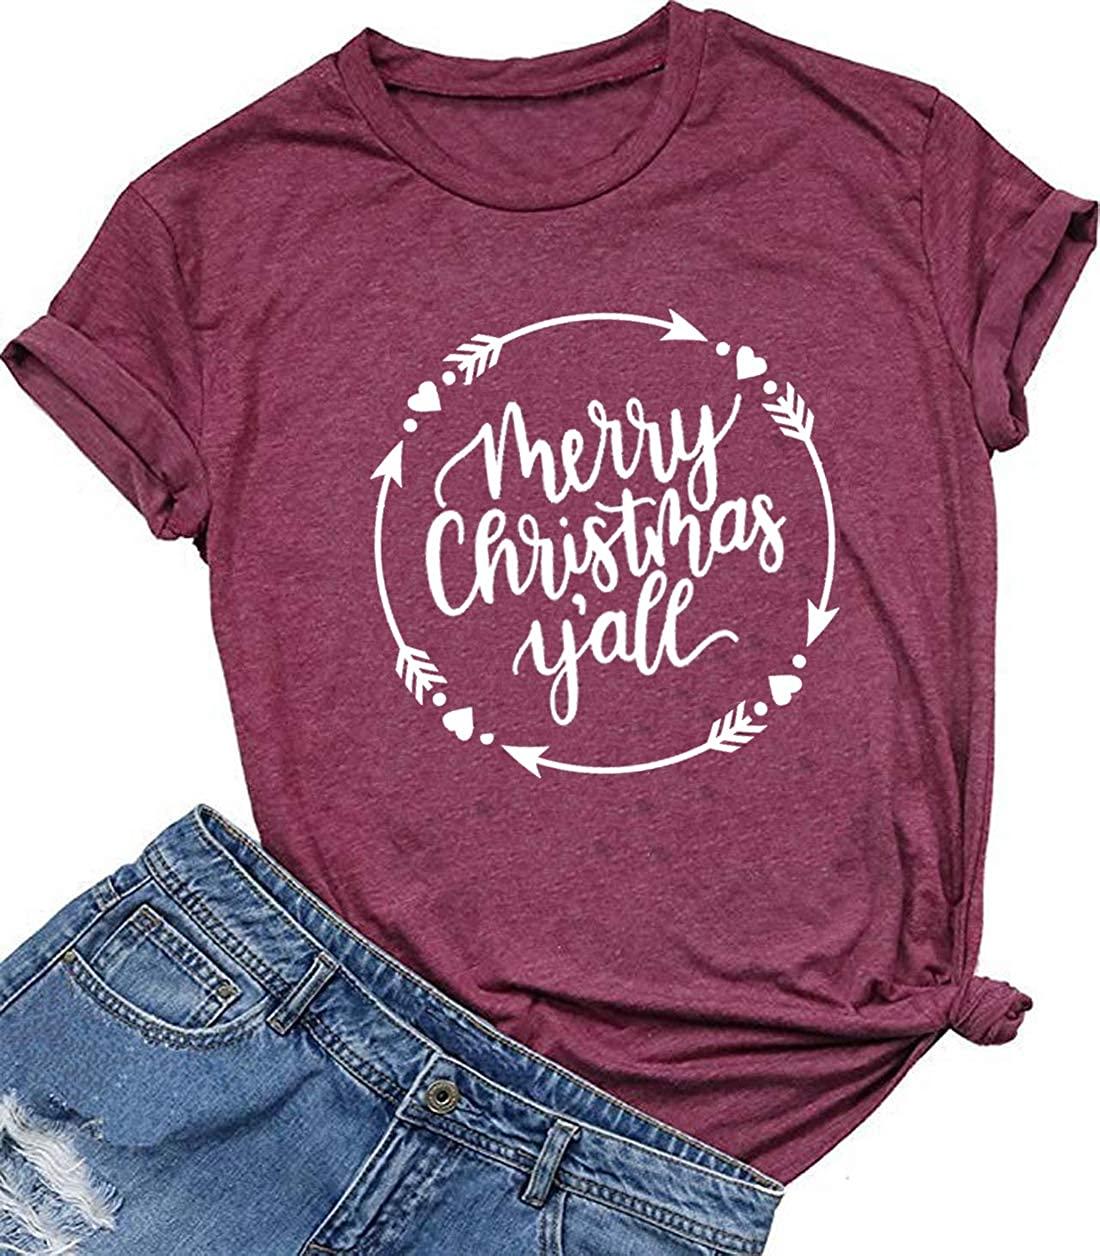 Merry Christmas Y'all Letter Print T-Shirt Women Christmas Cute Graphic Short Sleeve Tee Shirt Top